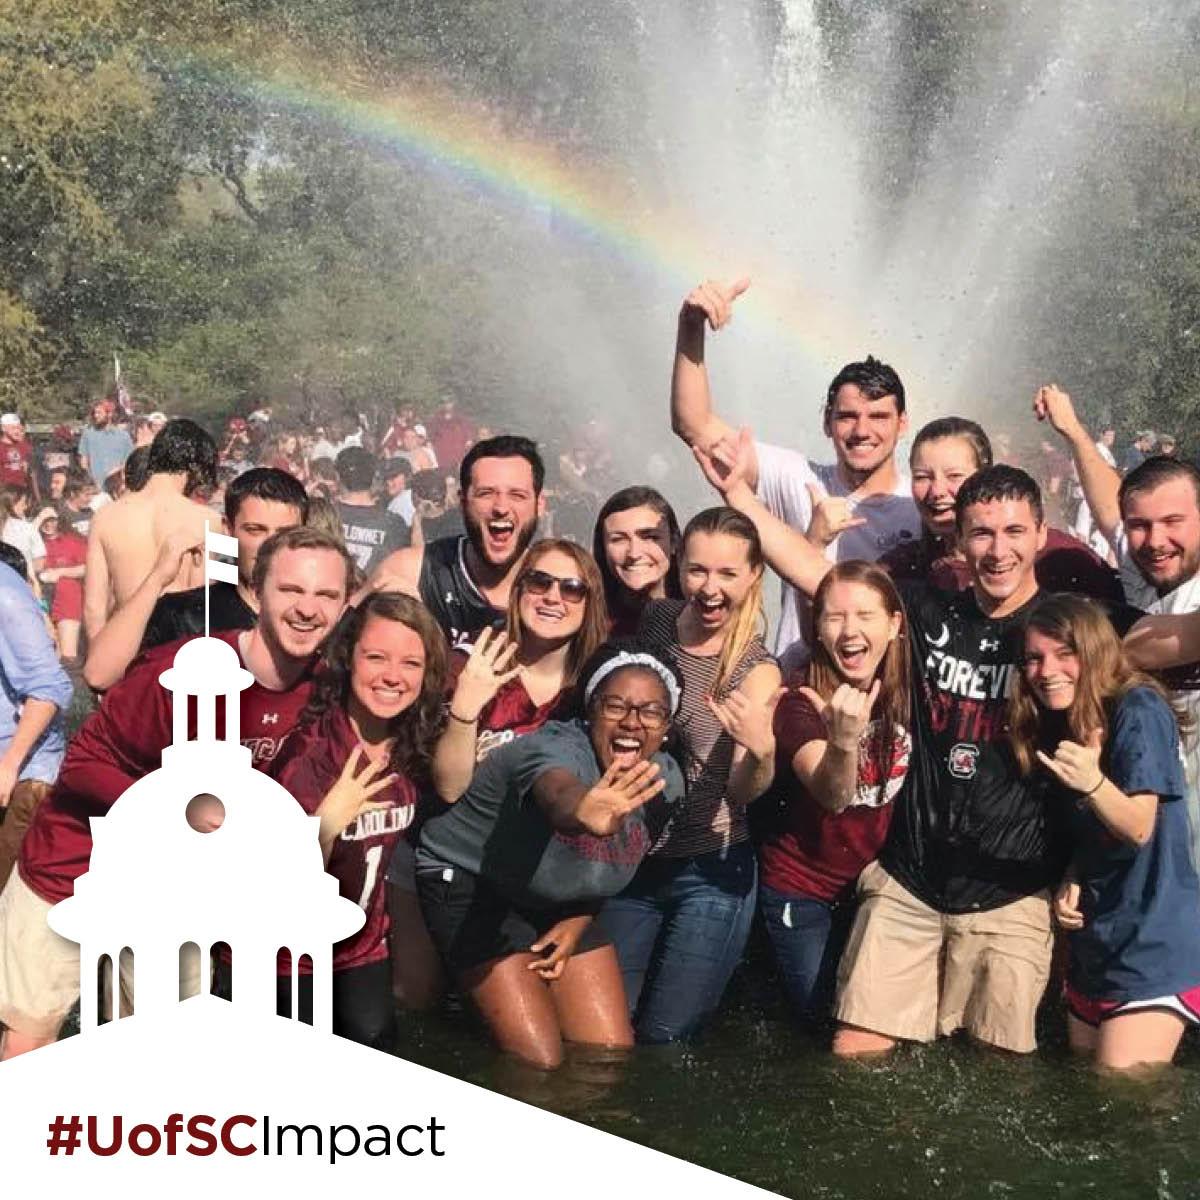 students celebrating #UofSCImpact